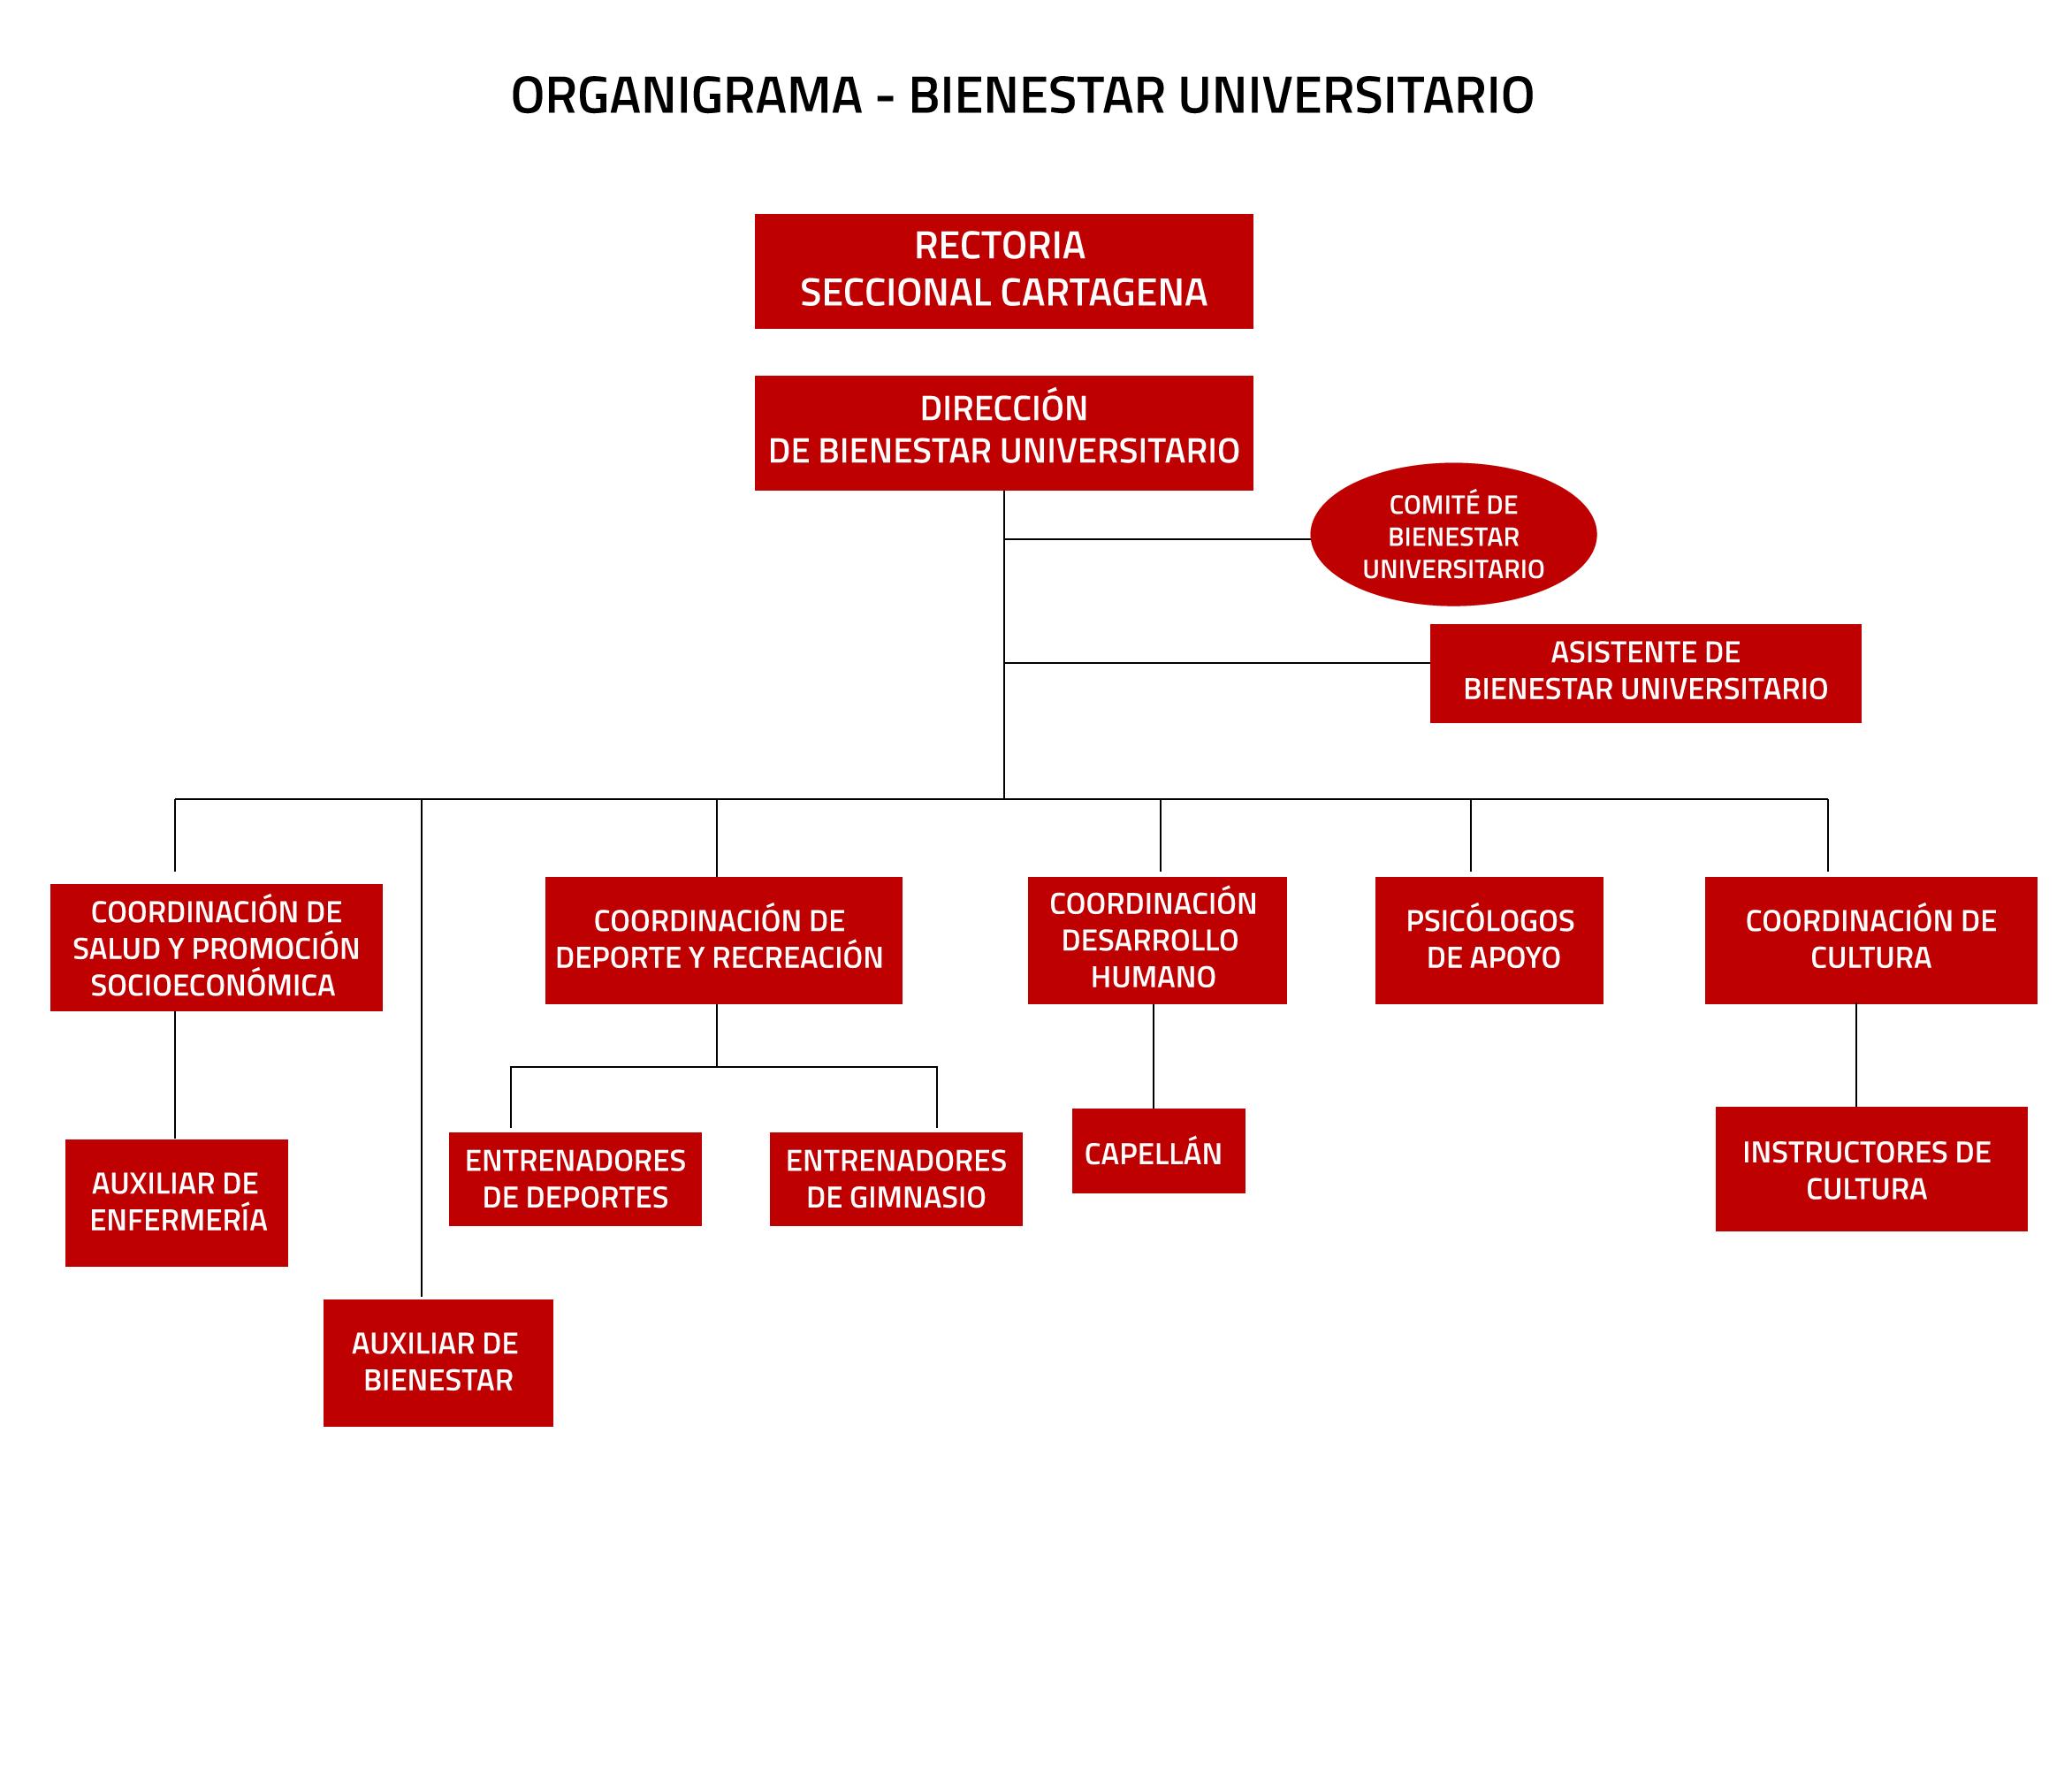 ORGANIGRAMA-BIENESTAR-UNIVERSITARIO